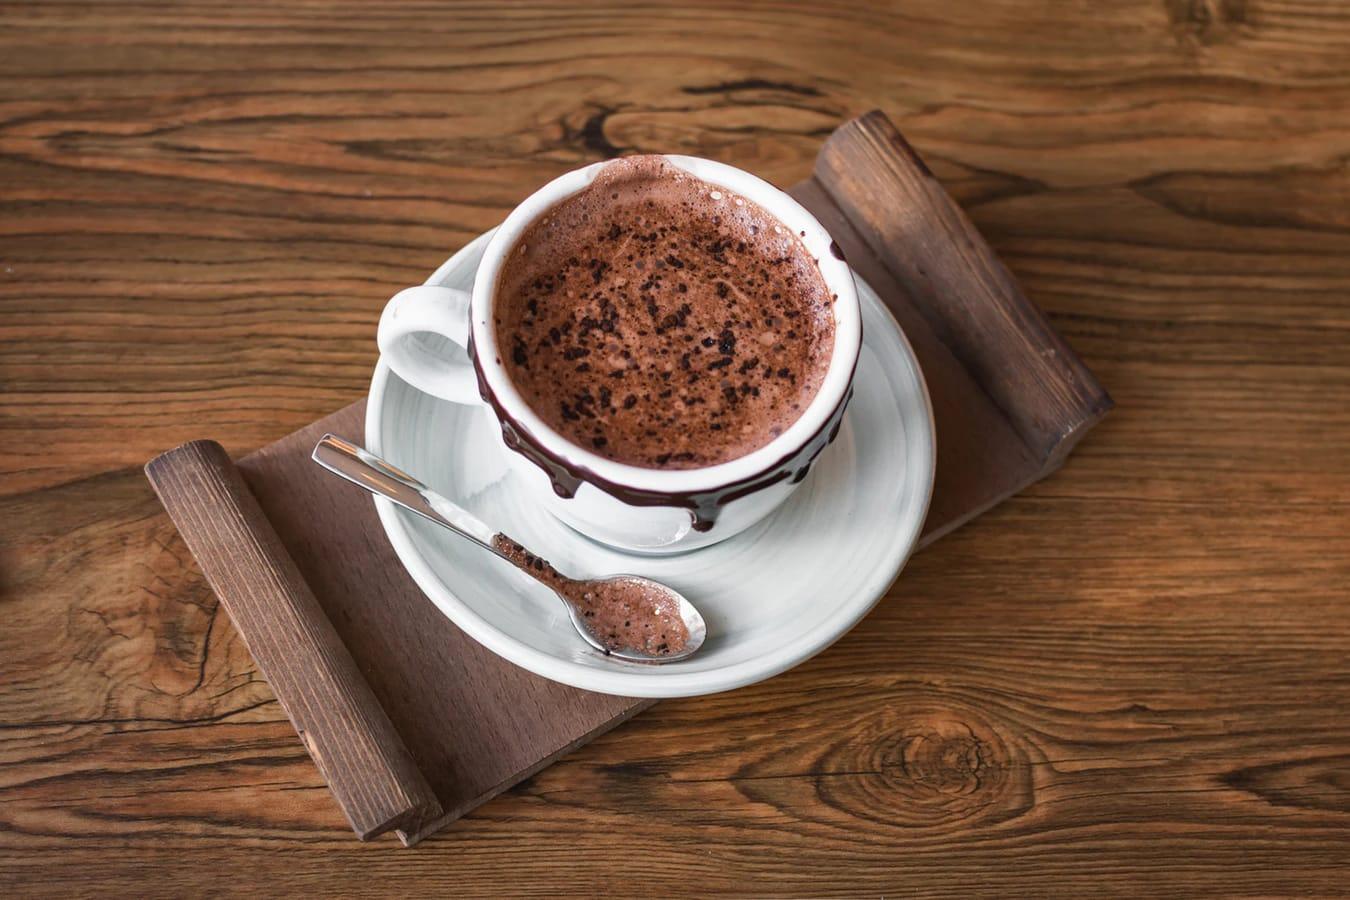 3 Best Hot Chocolate Spots in Aspen